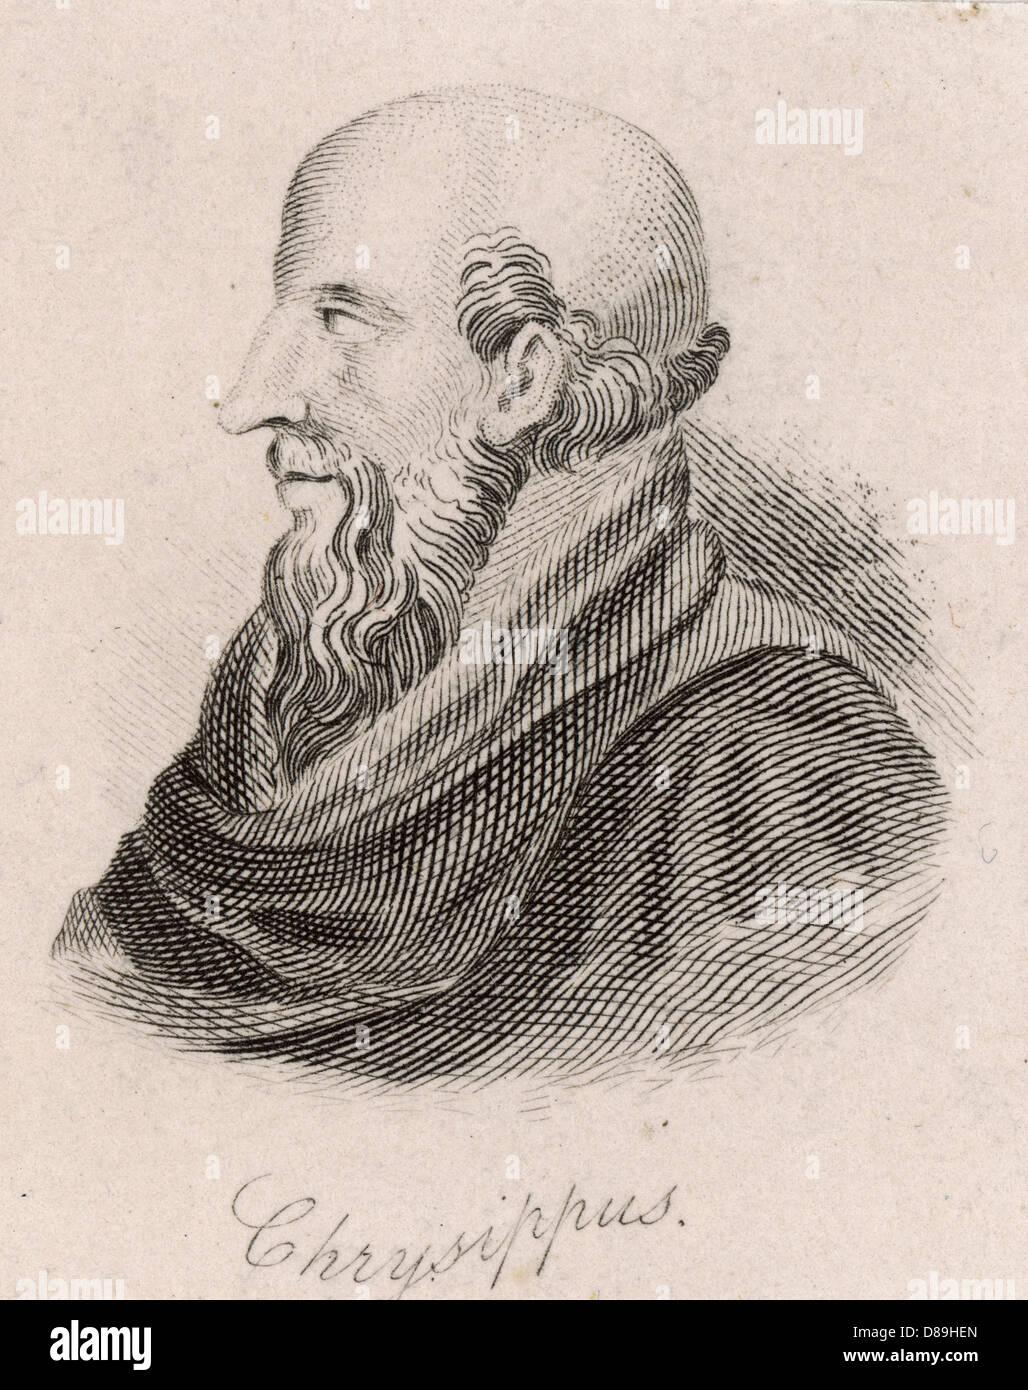 Chrysippus - Stock Image